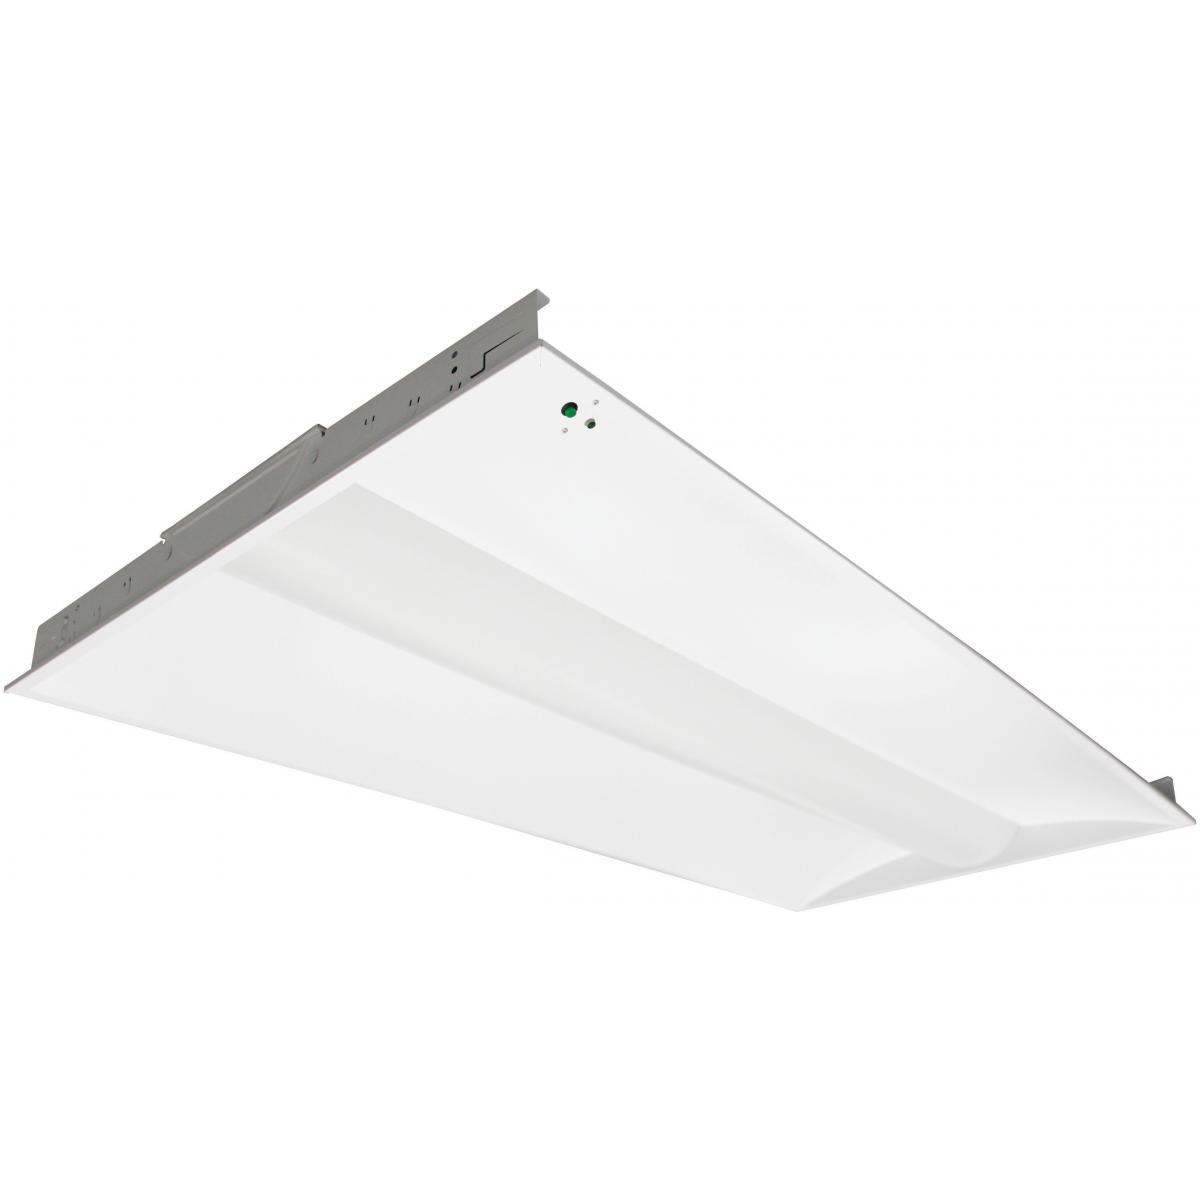 65-456 2FT X 4FT EM LED TROFFER 50W